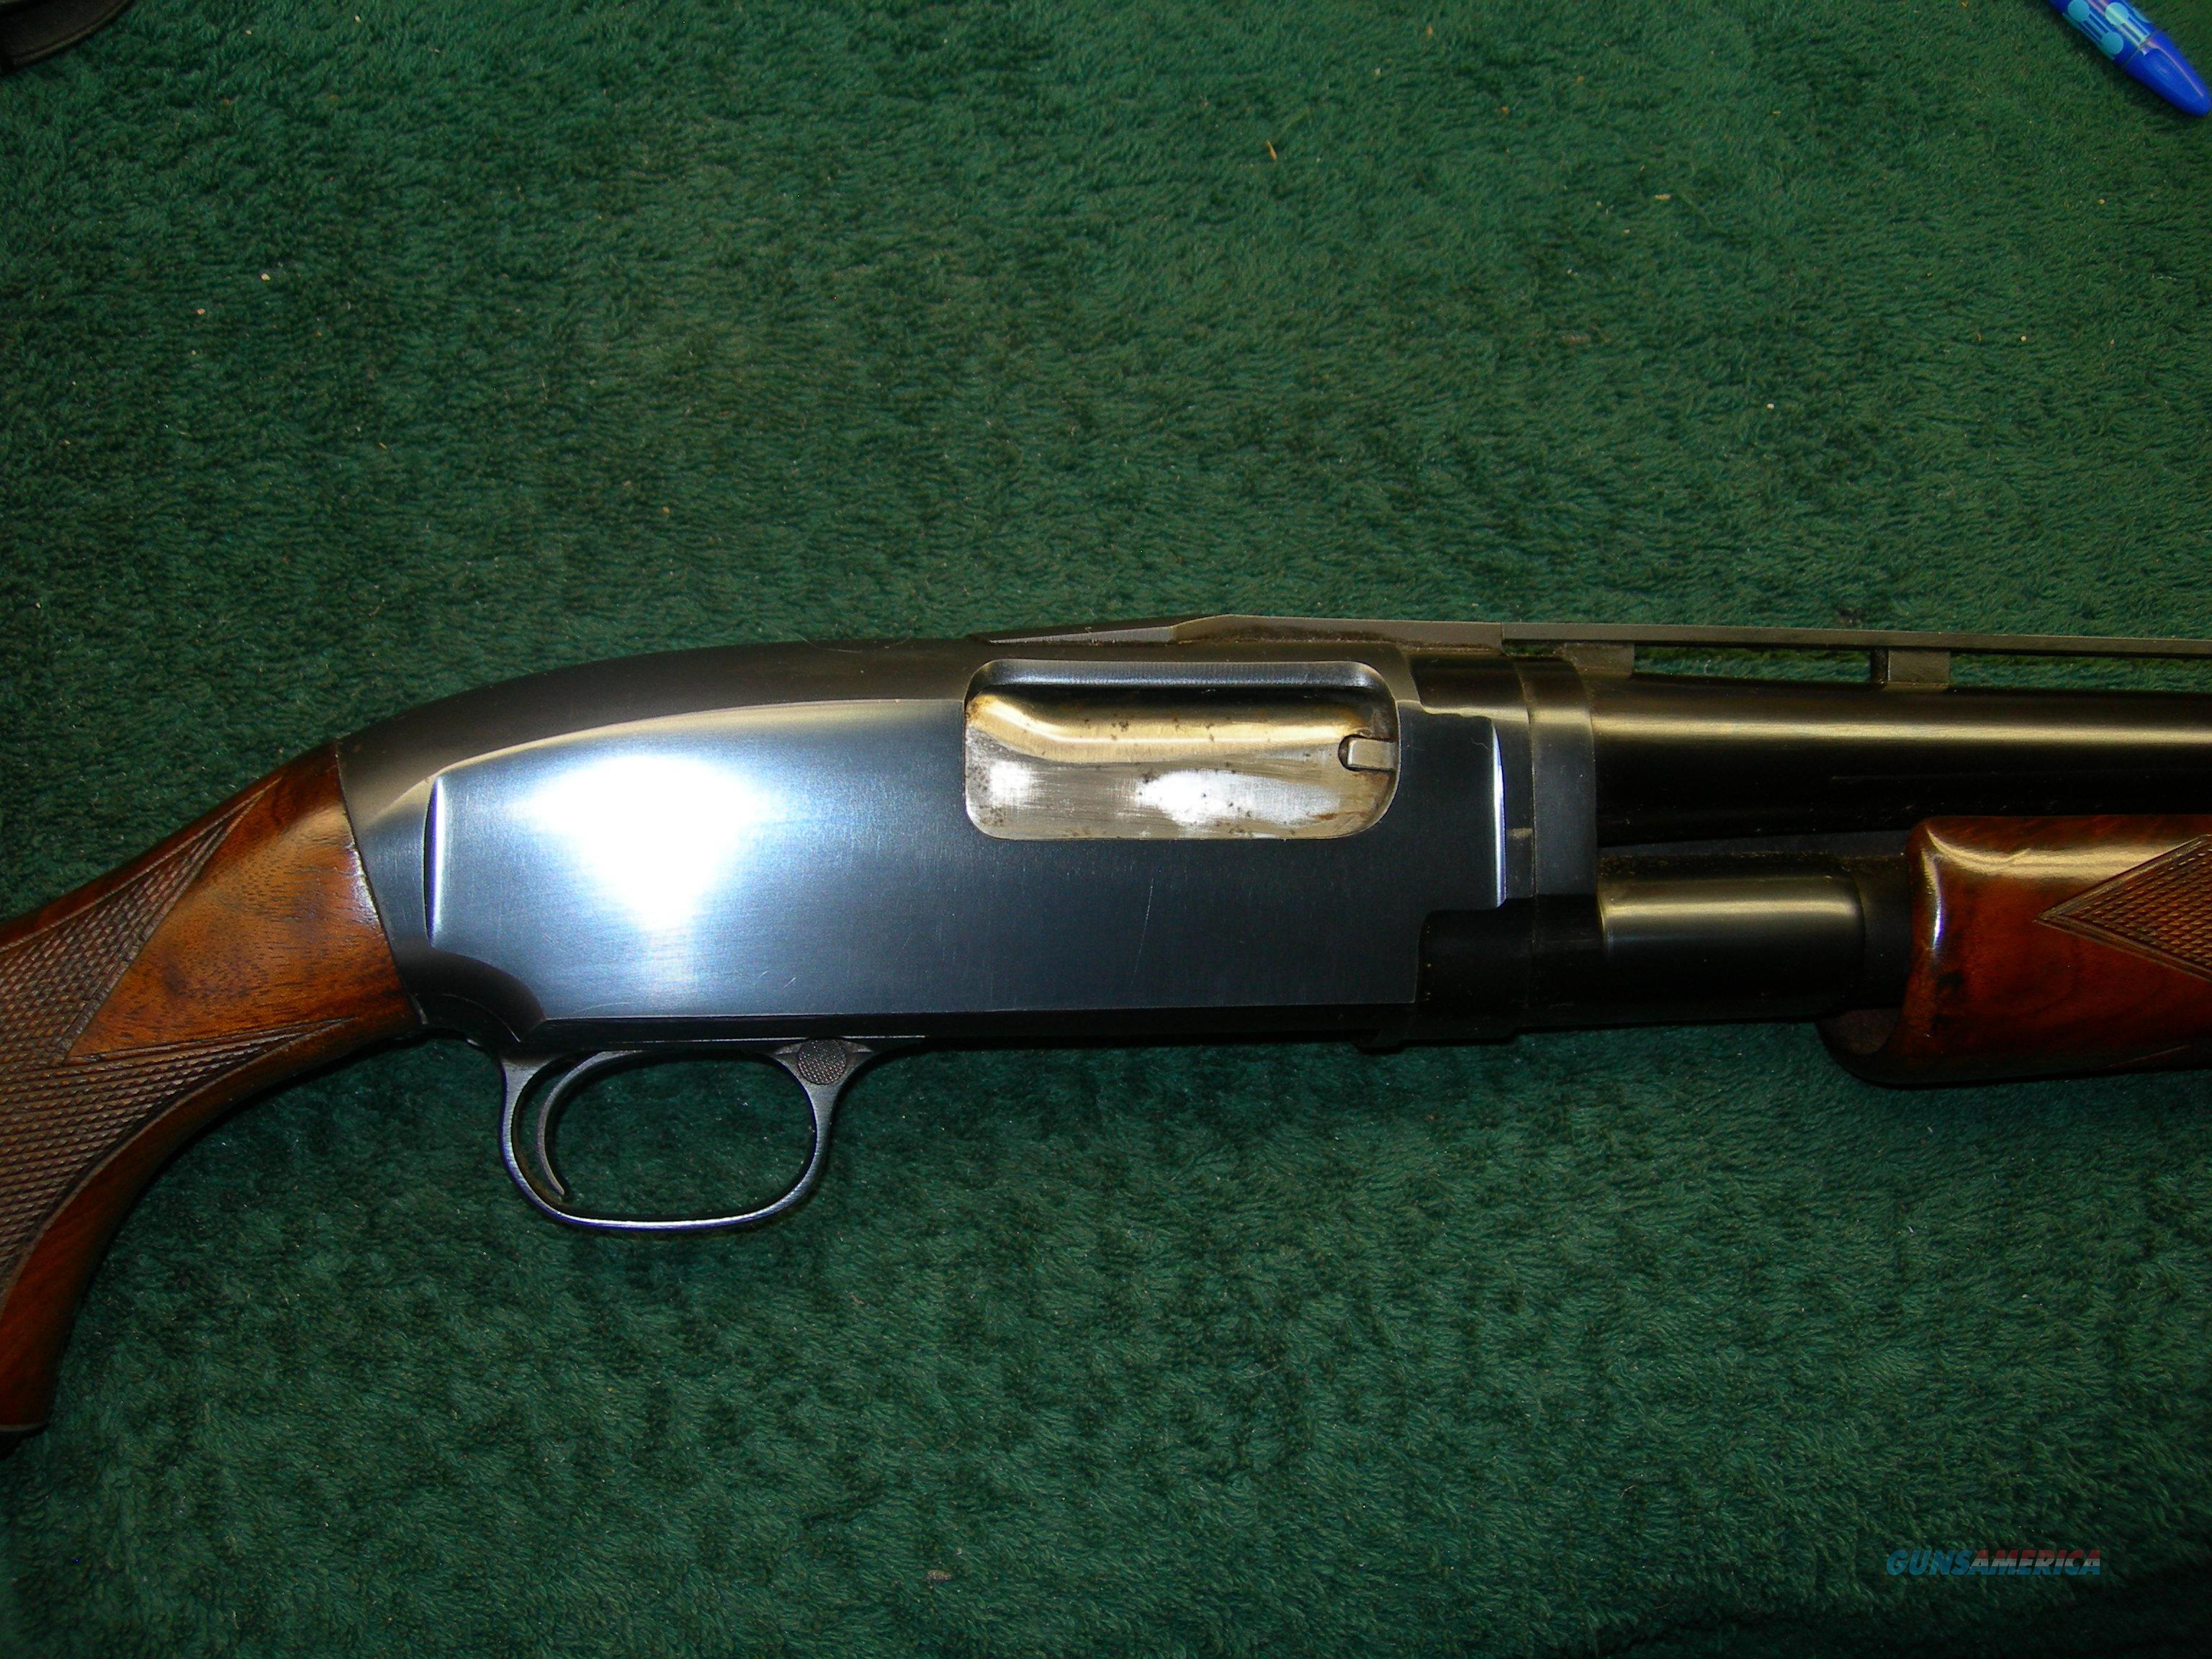 "#975: Winchester Mdl 12 Deluxe Skeet 20g Factory VR; 26"" Barrel,  Guns > Shotguns > Winchester Shotguns - Modern > Pump Action > Trap/Skeet"